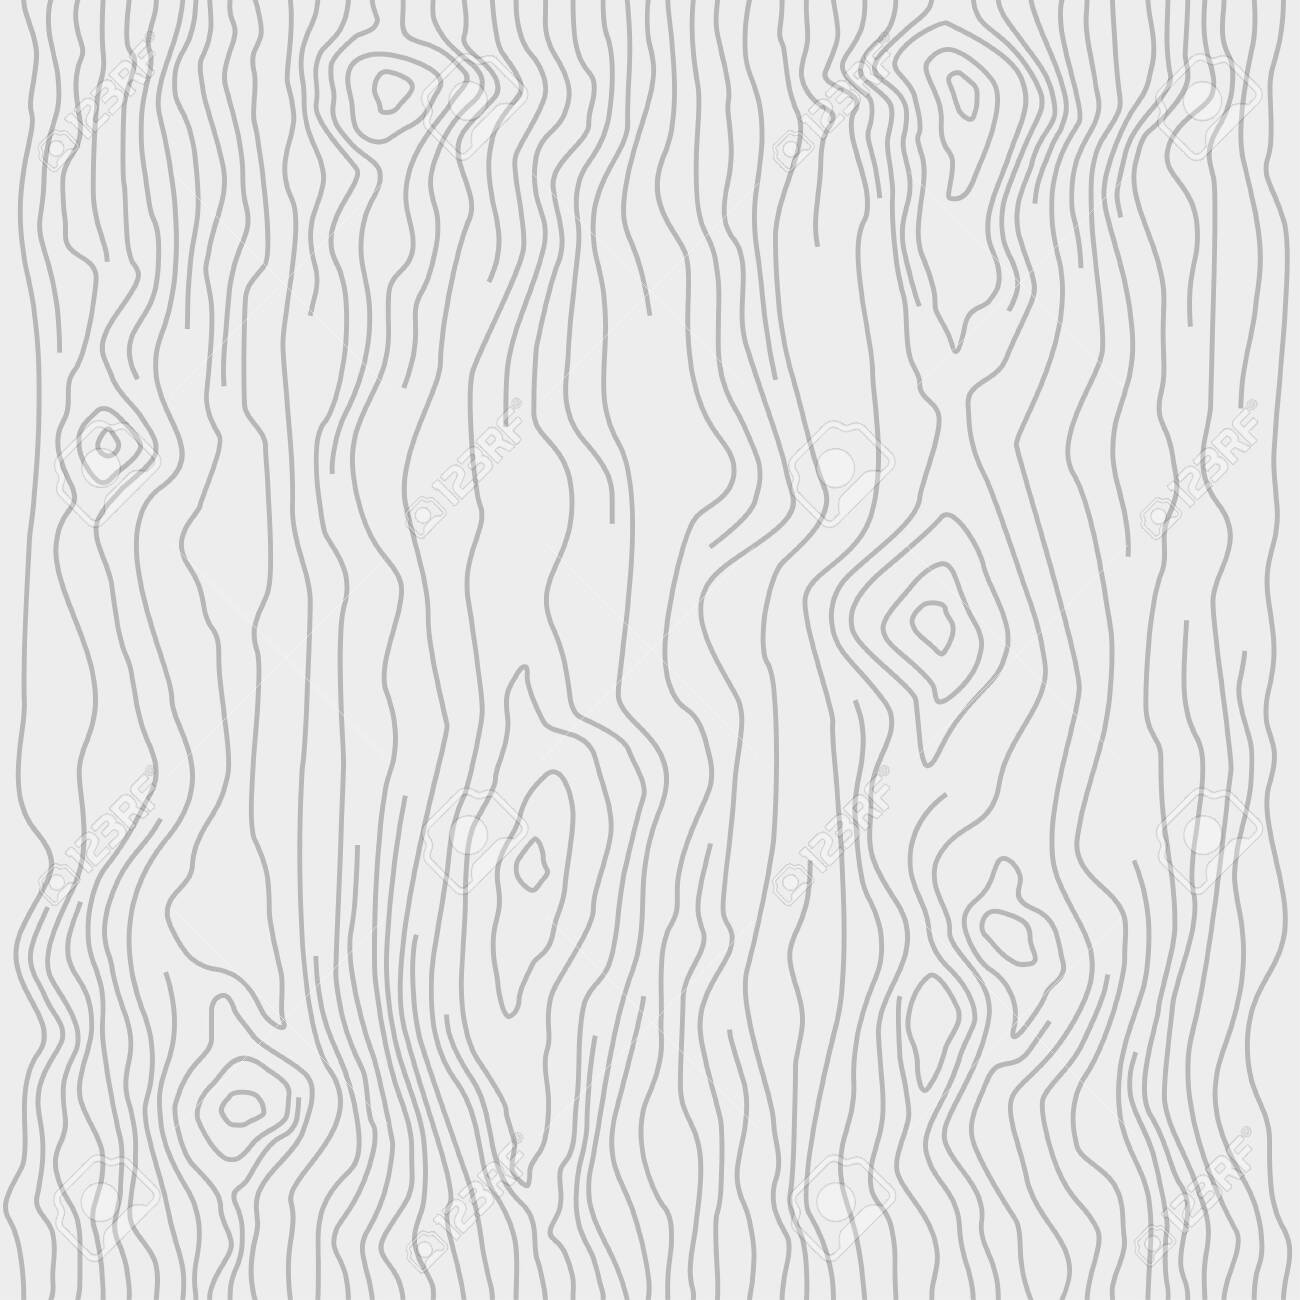 Seamless wooden pattern. Wood grain texture. Dense lines. Light gray background. Vector illustration - 125015346